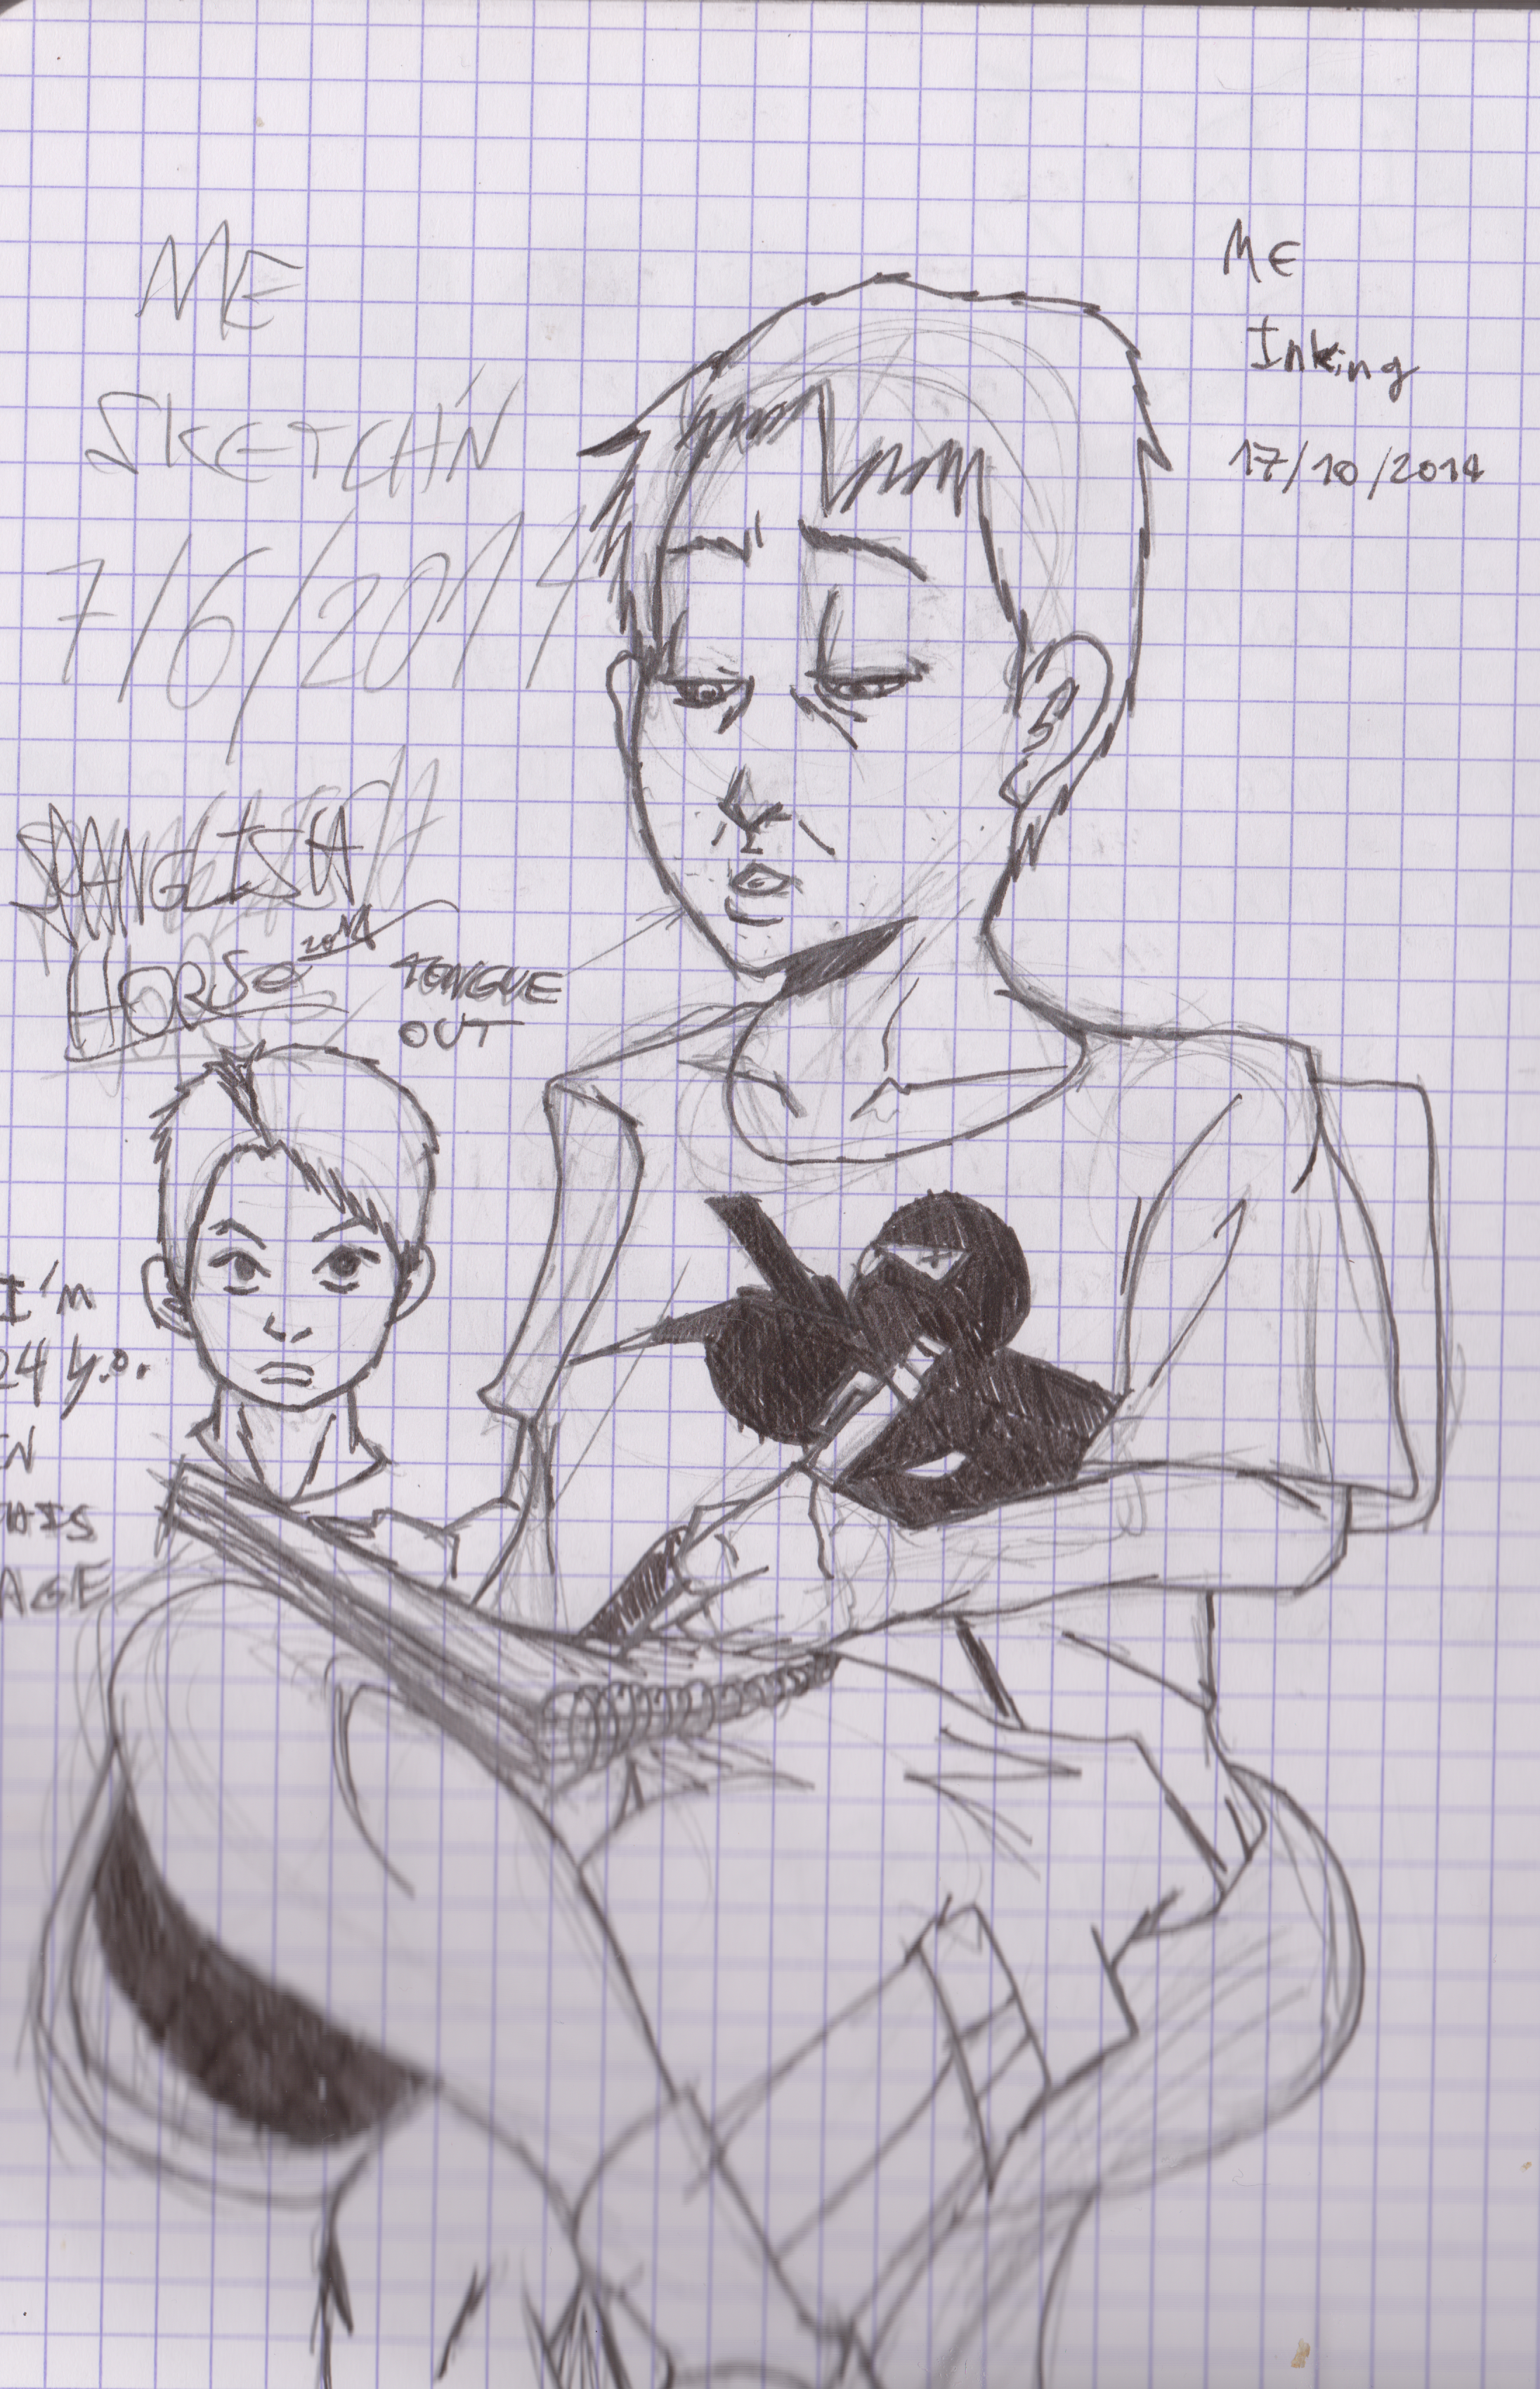 SH sketchbook page 15